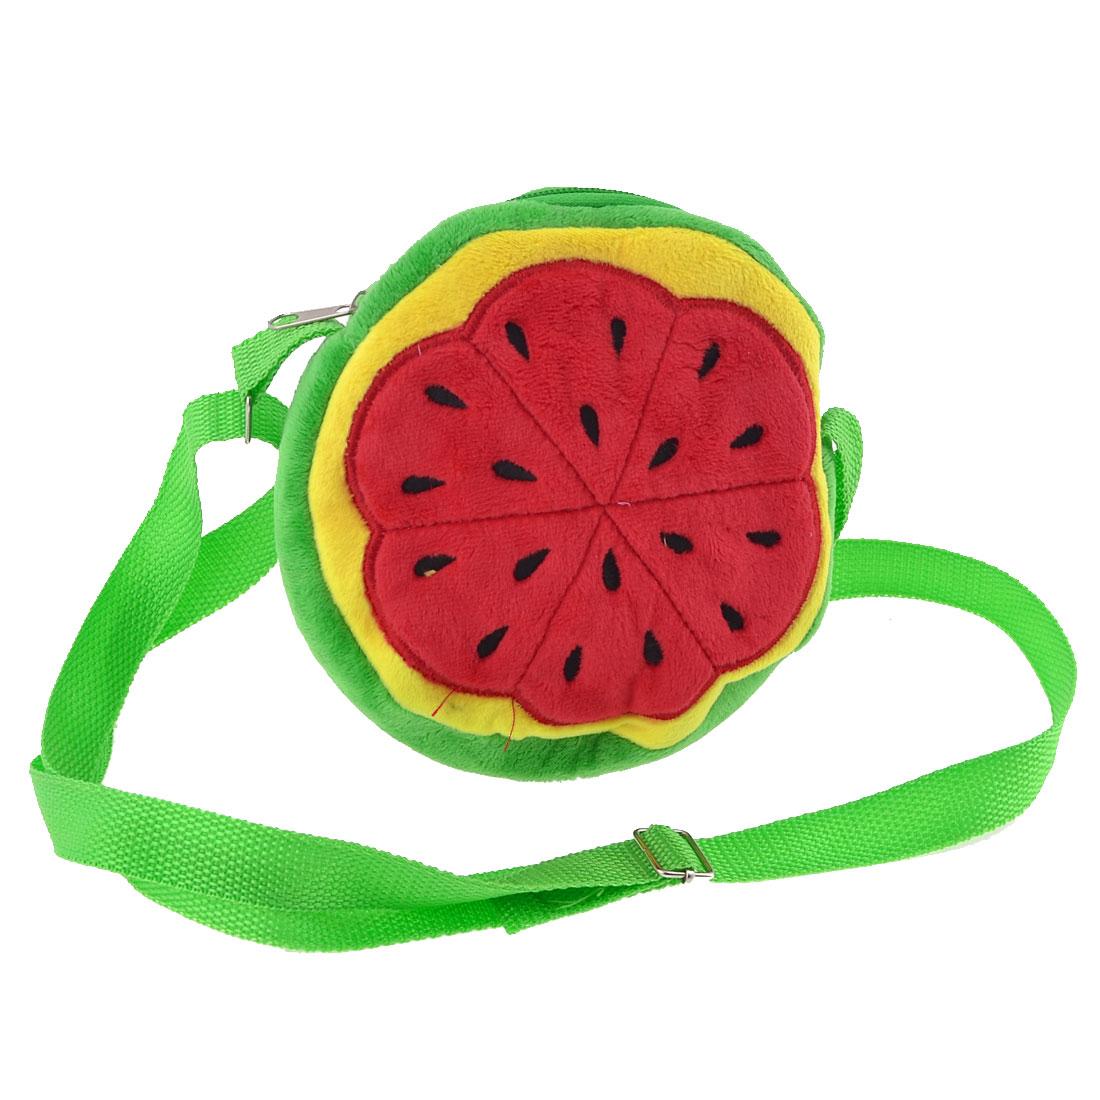 Lady Watermelon Pulp Pattern Fluffy Mini Adjustable Shoulder Strap Bag